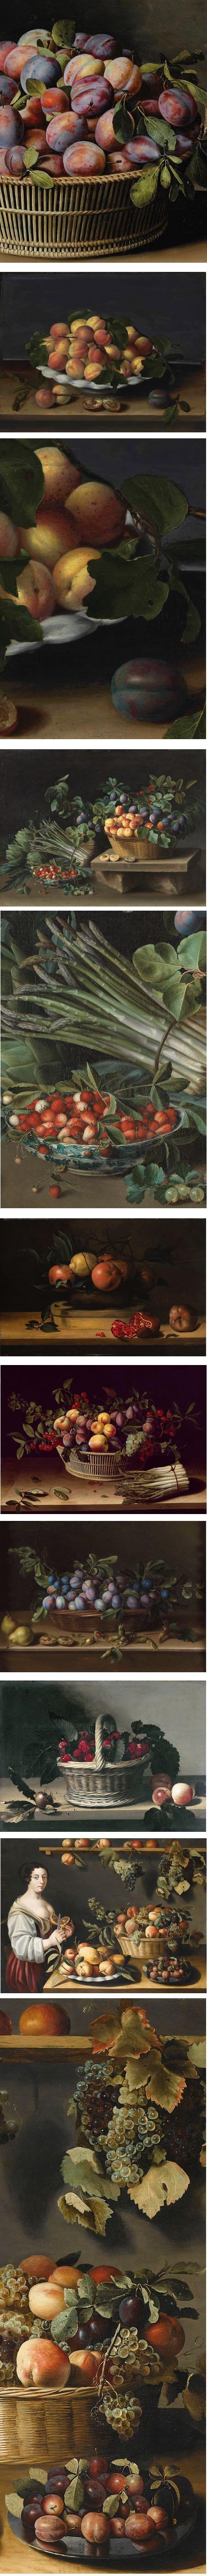 Louise Moillon, Baroque still life painting